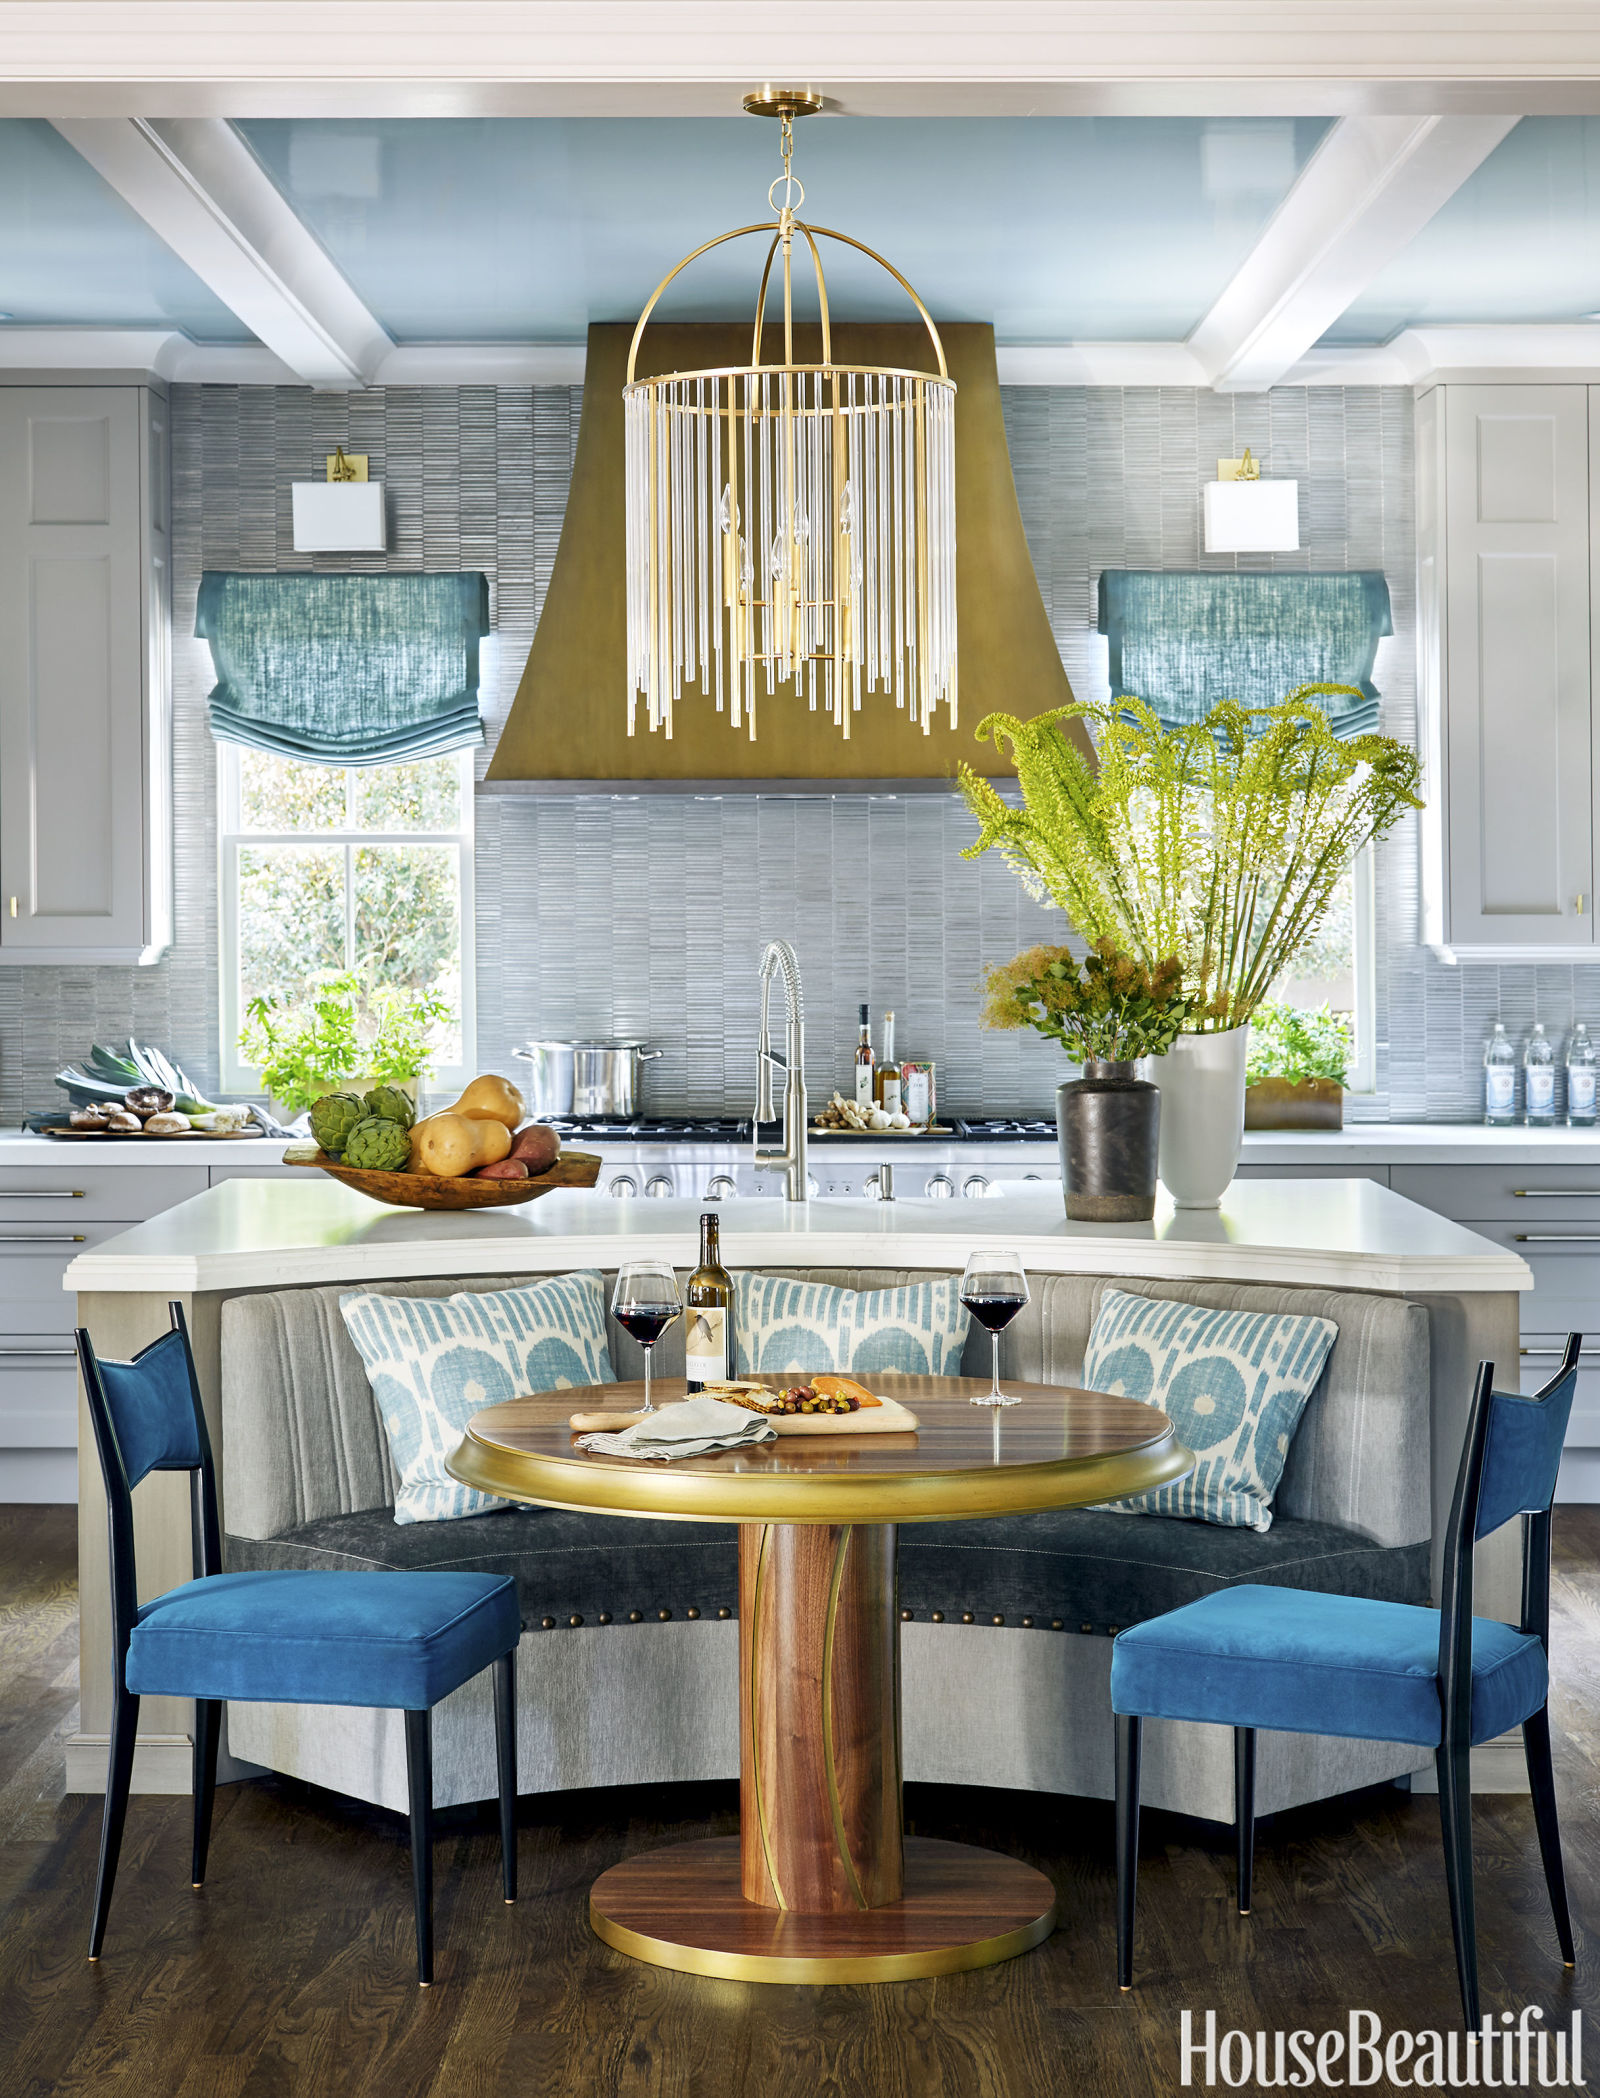 Best Kitchen Lighting Ideas Modern Light Fixtures For Home - Home design lighting